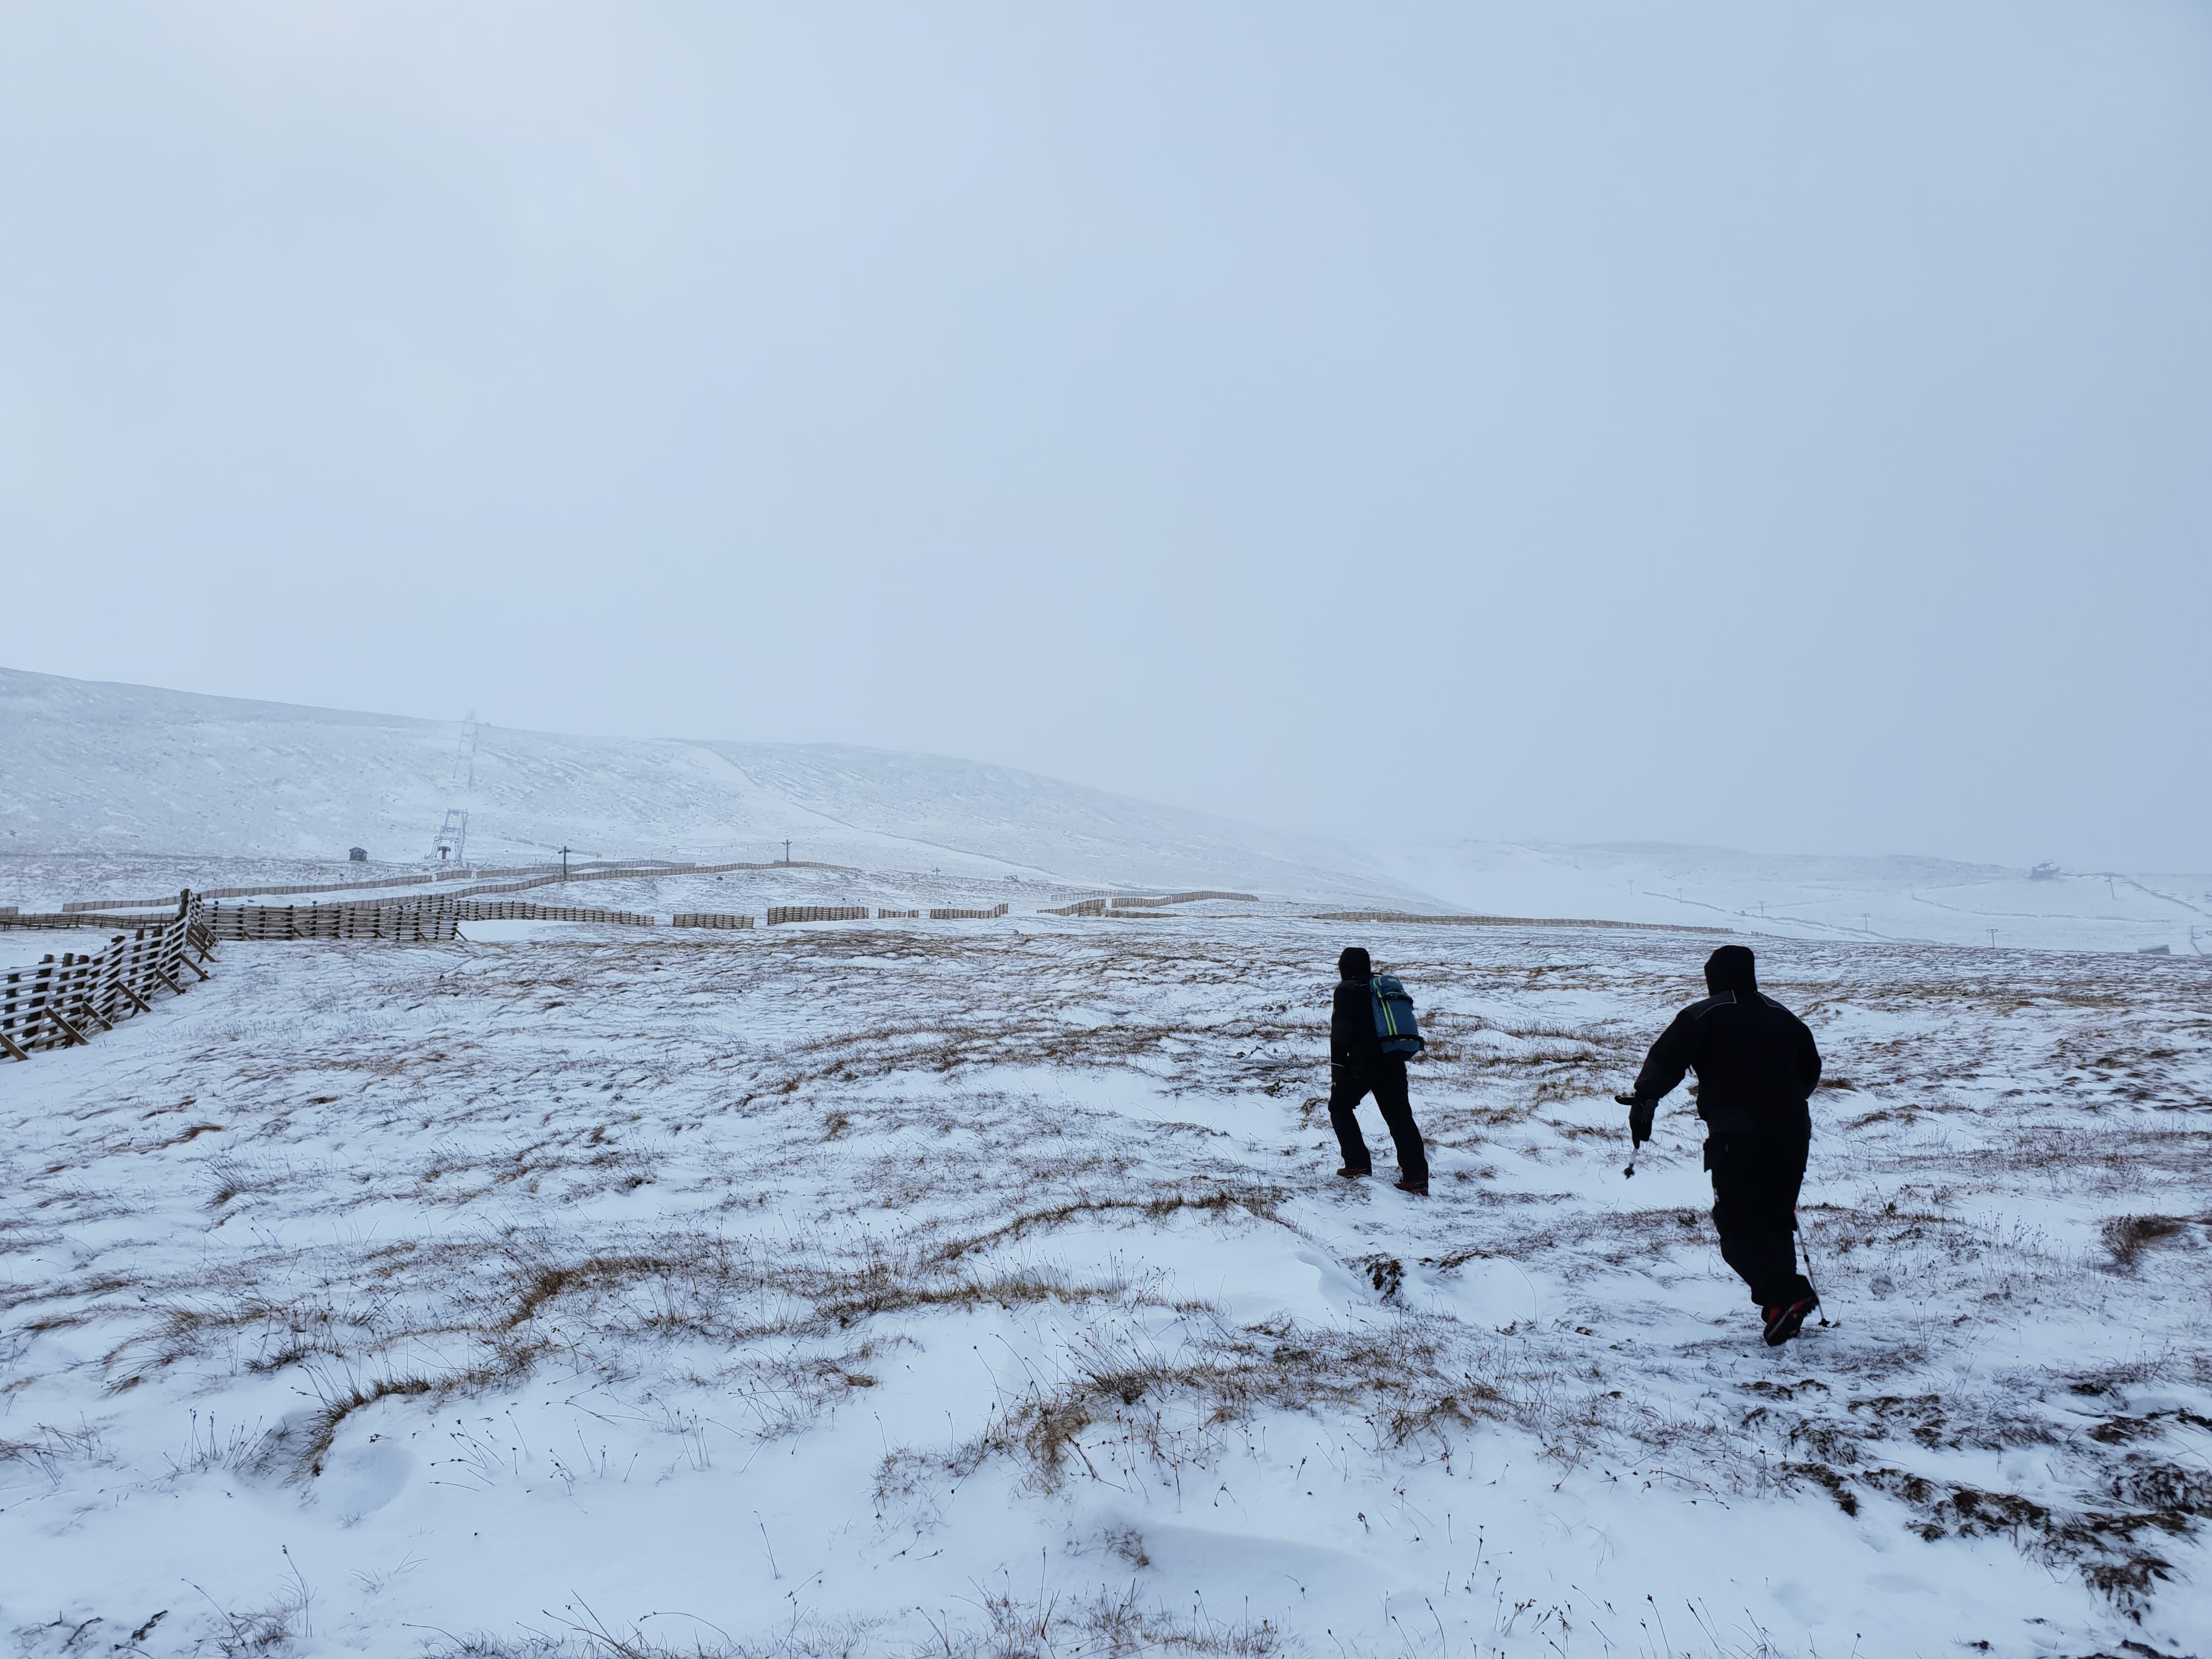 The Nevis Range hasn't got quite enough snow to ski on as yet.